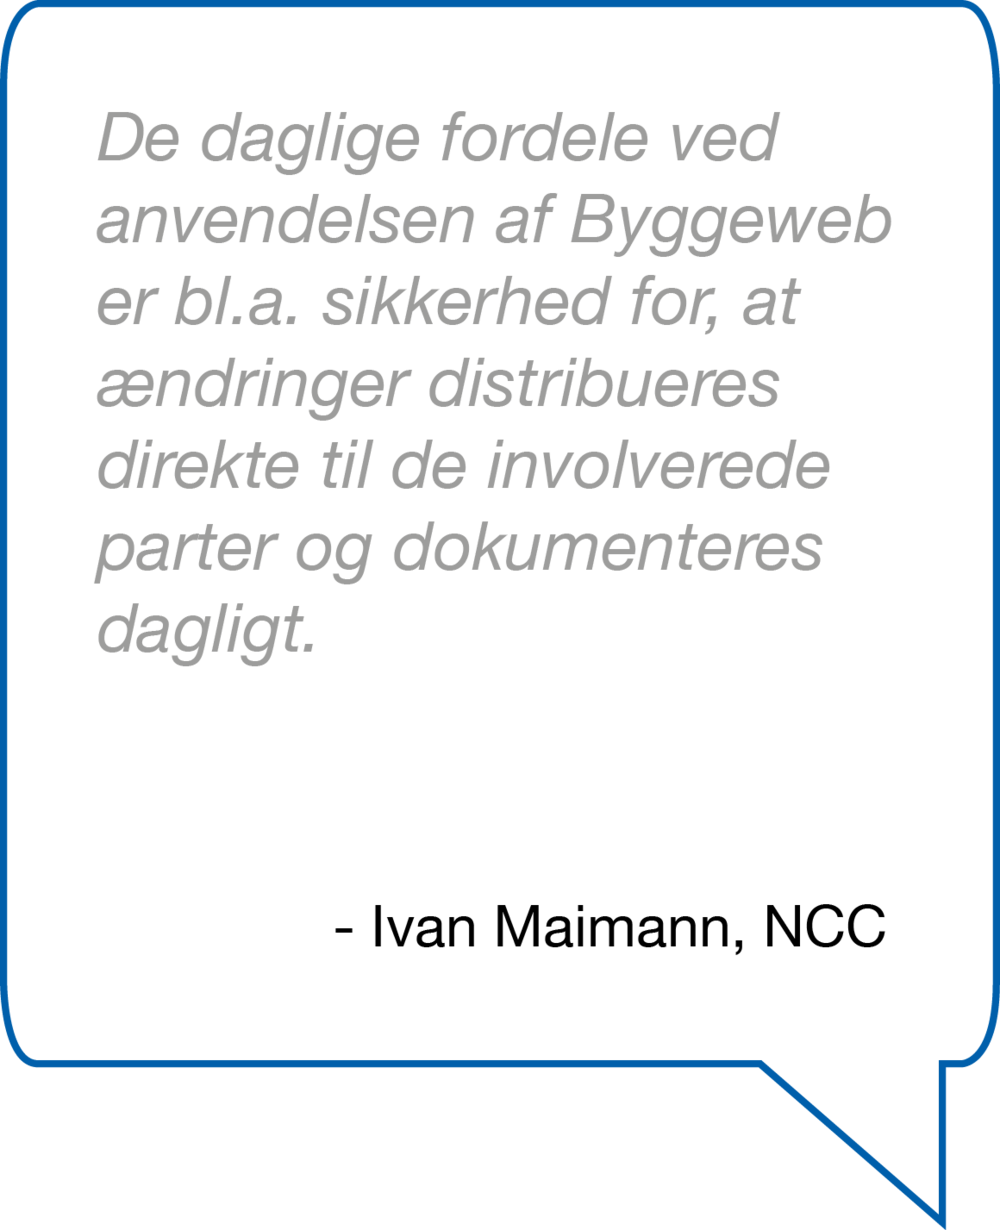 RIB Byggeweb citat NCC